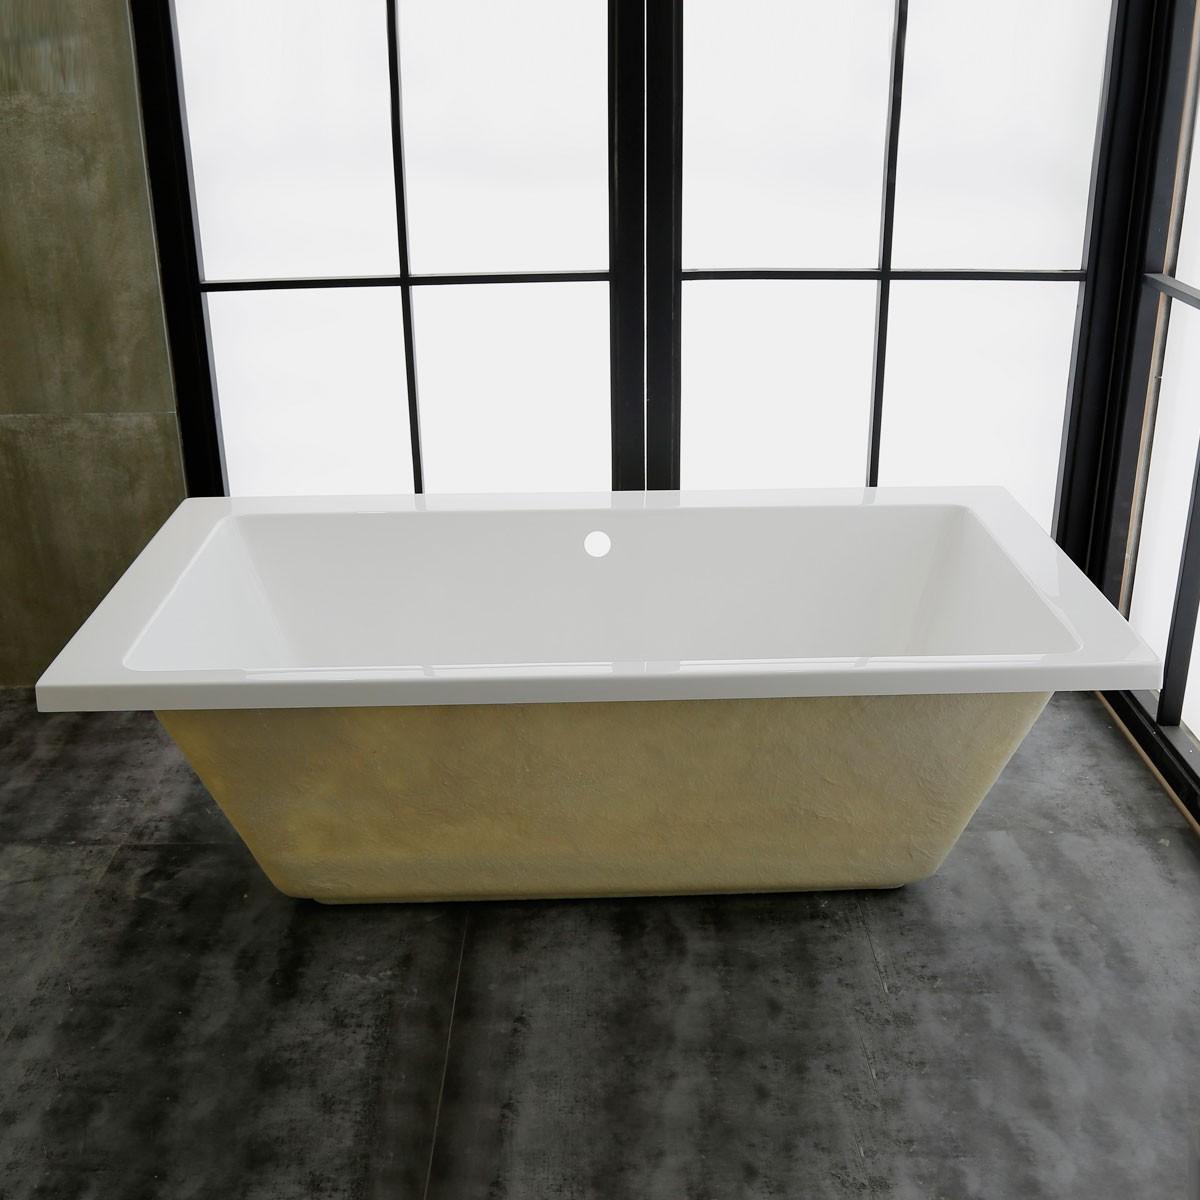 67 In Built-in Bathtub - Acrylic White (DK-MEC3057B)